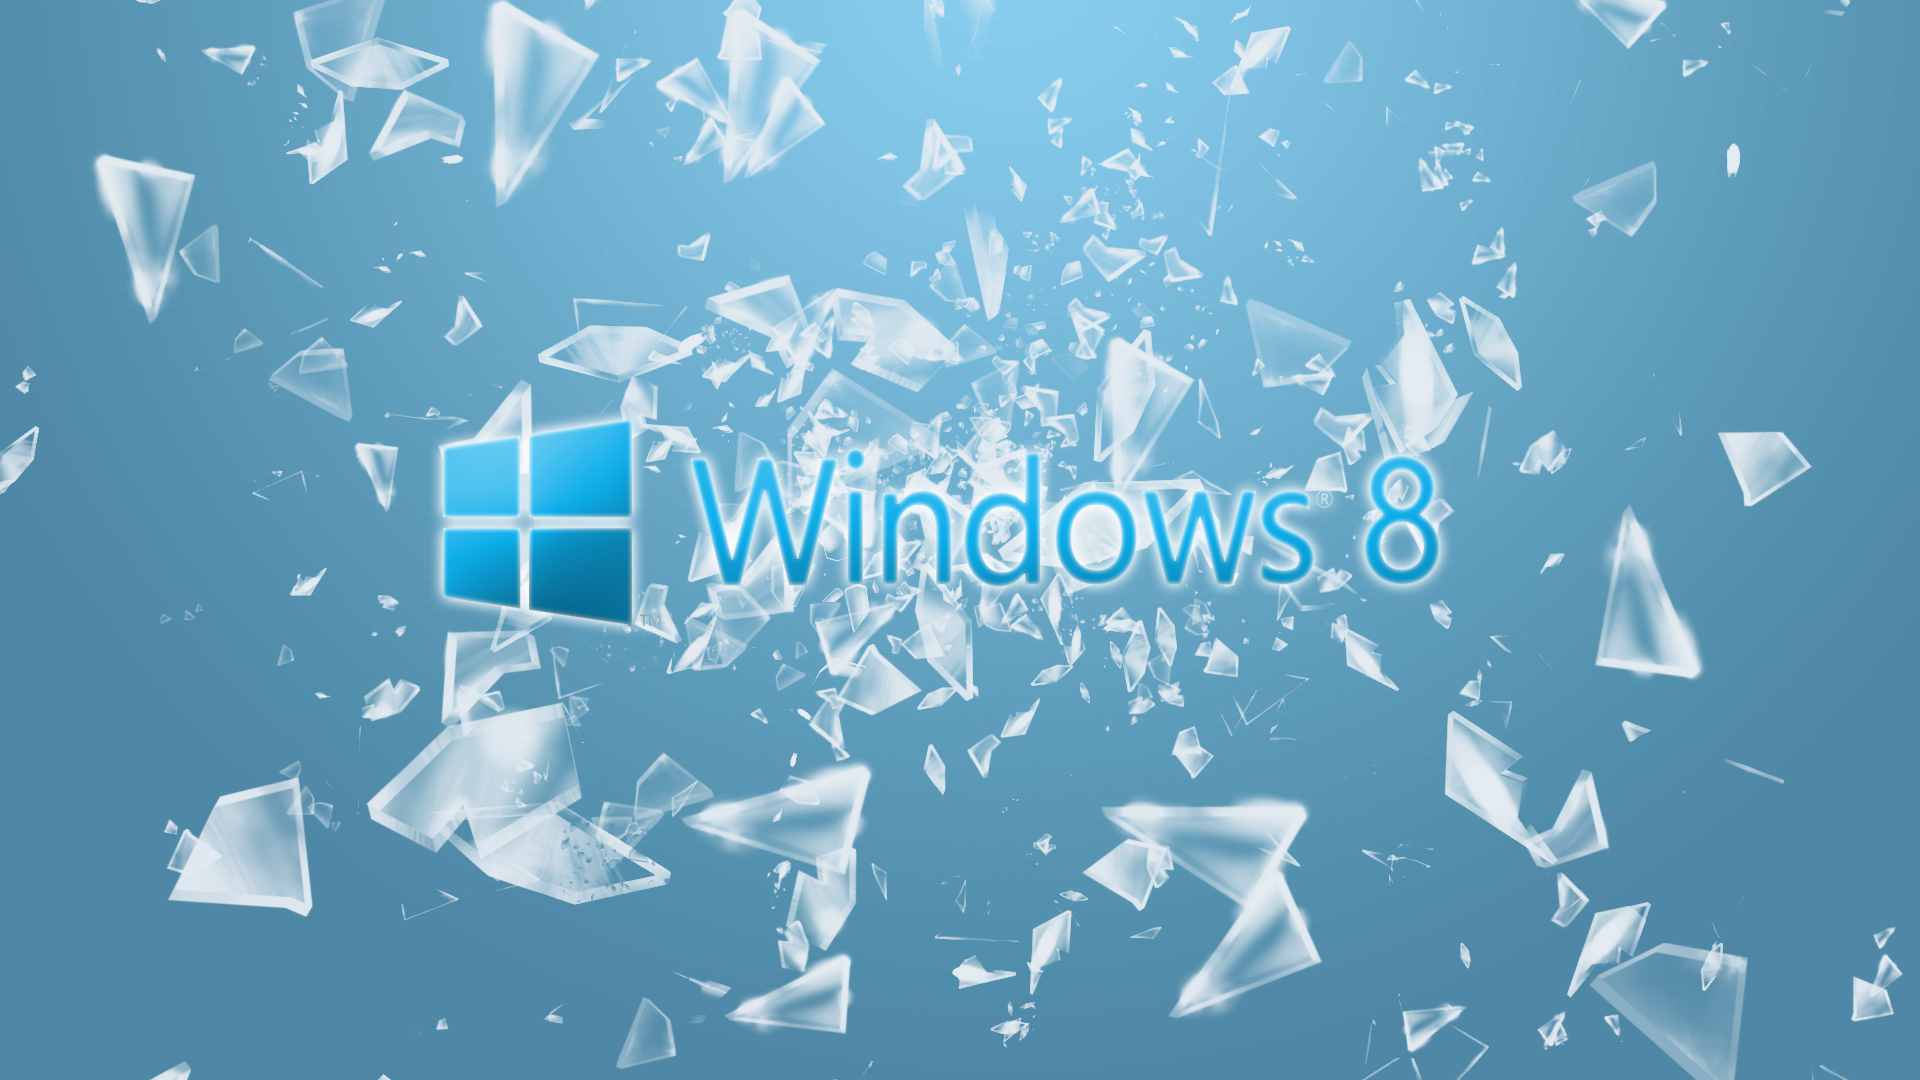 Wallpaper Windows 8  № 1929016 загрузить